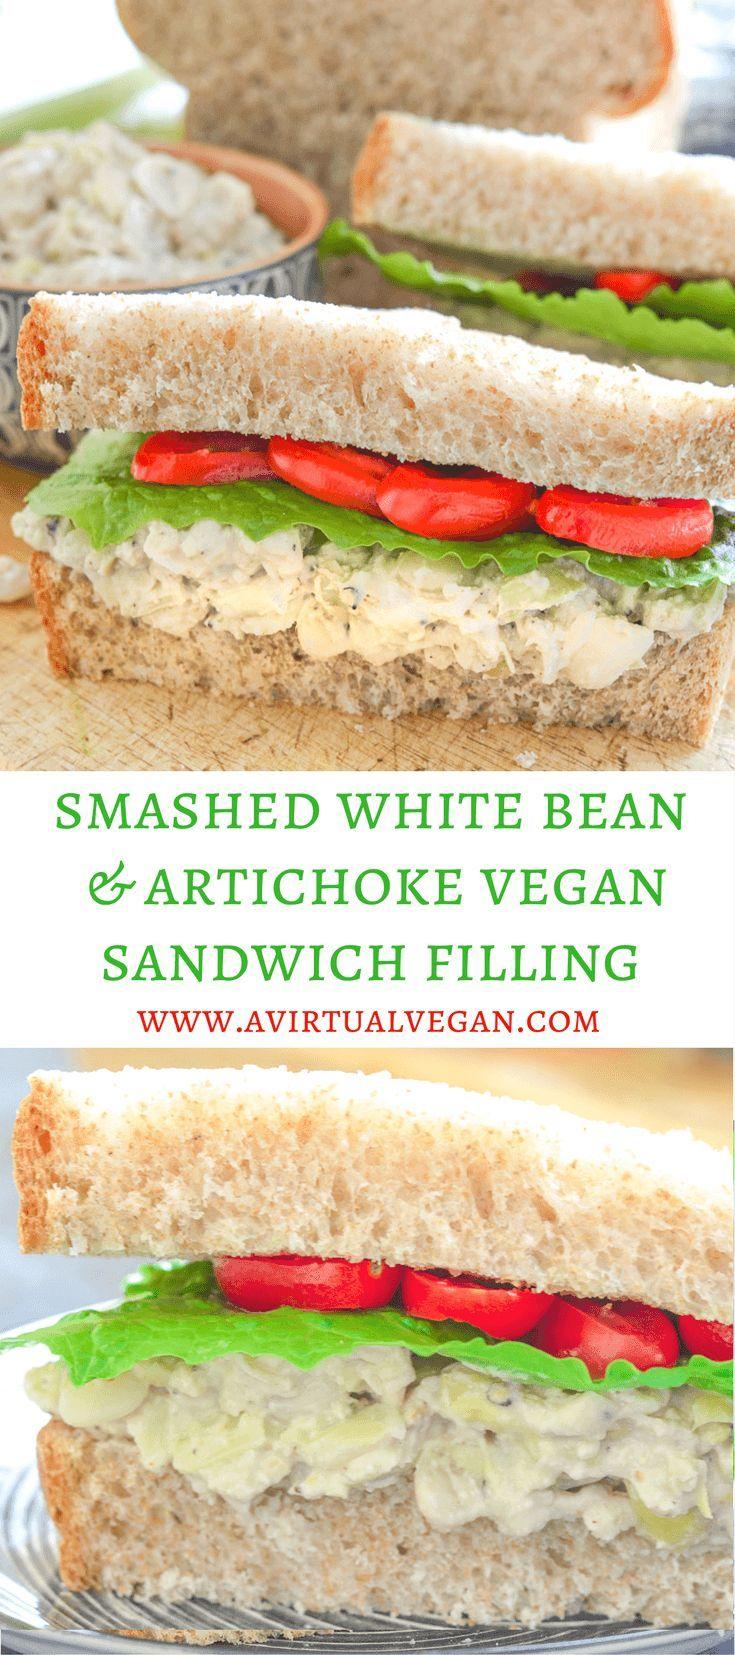 Creamy Smashed White Bean & Artichoke Vegan Sandwich Filling with hints of rosemary & lemon. Fresh, delicious & so easy to make!  via @avirtualvegan